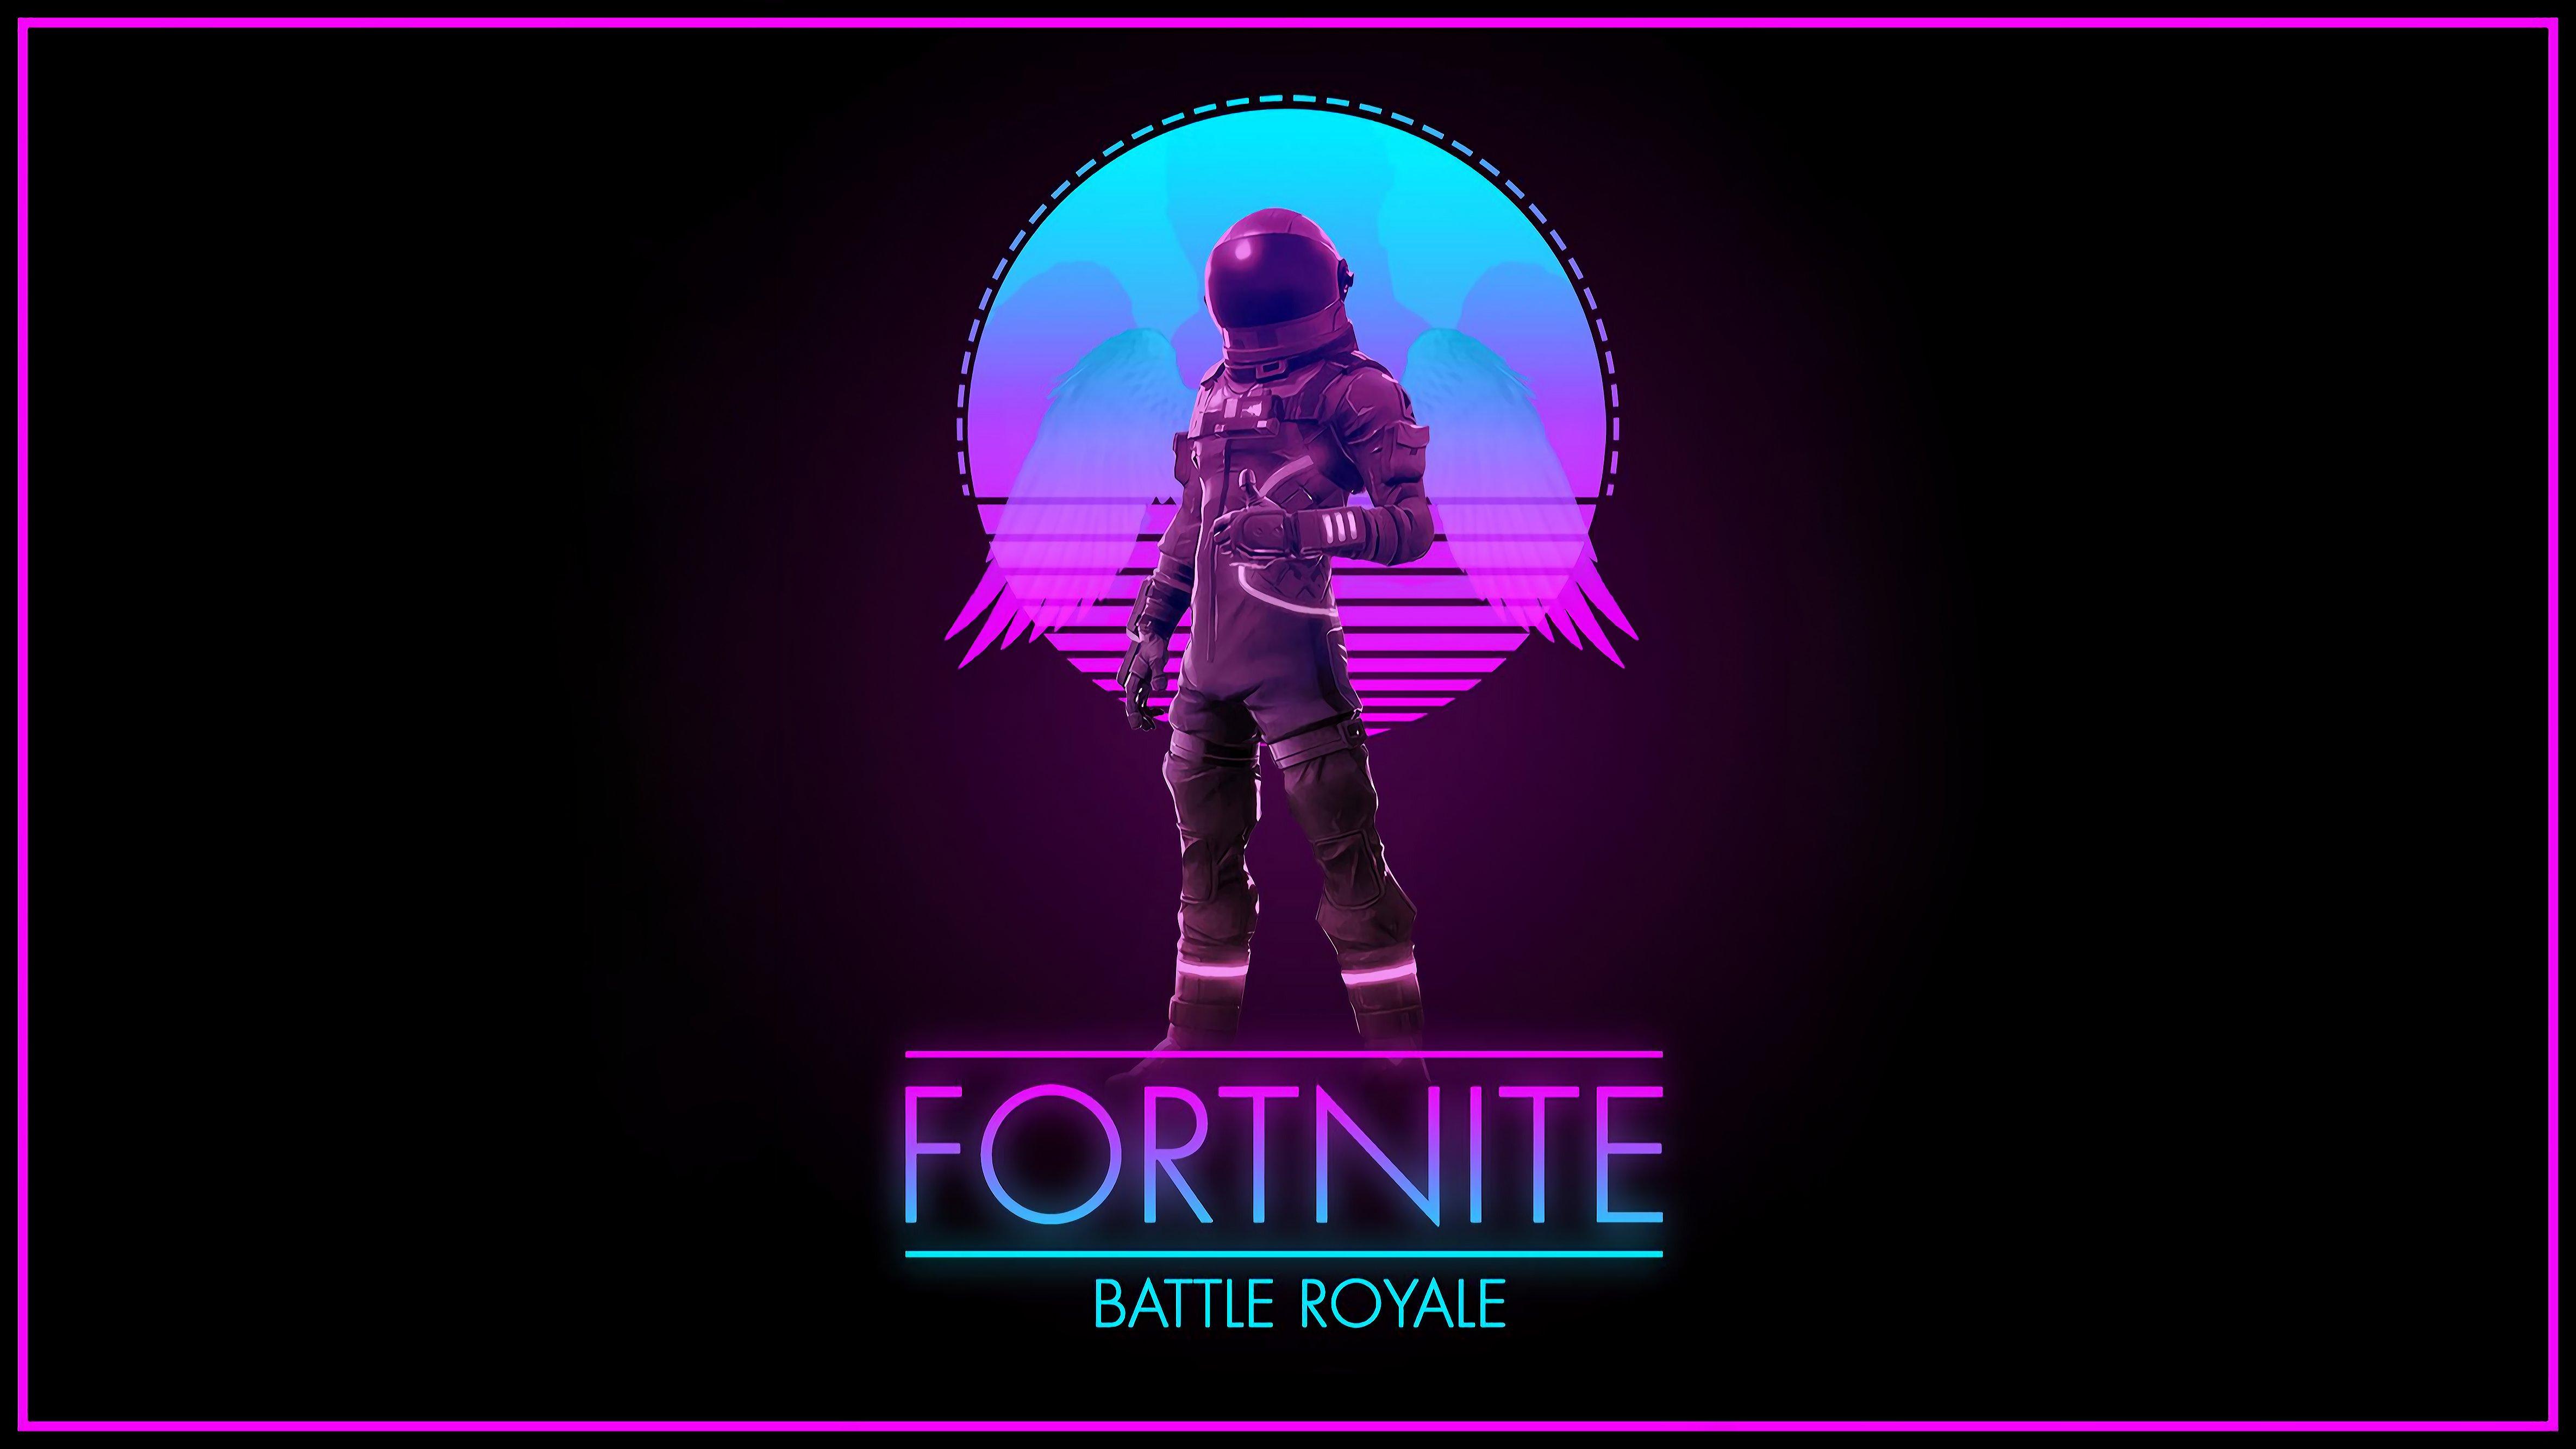 Fortnite Synthwave Royale 4k Wallpaper